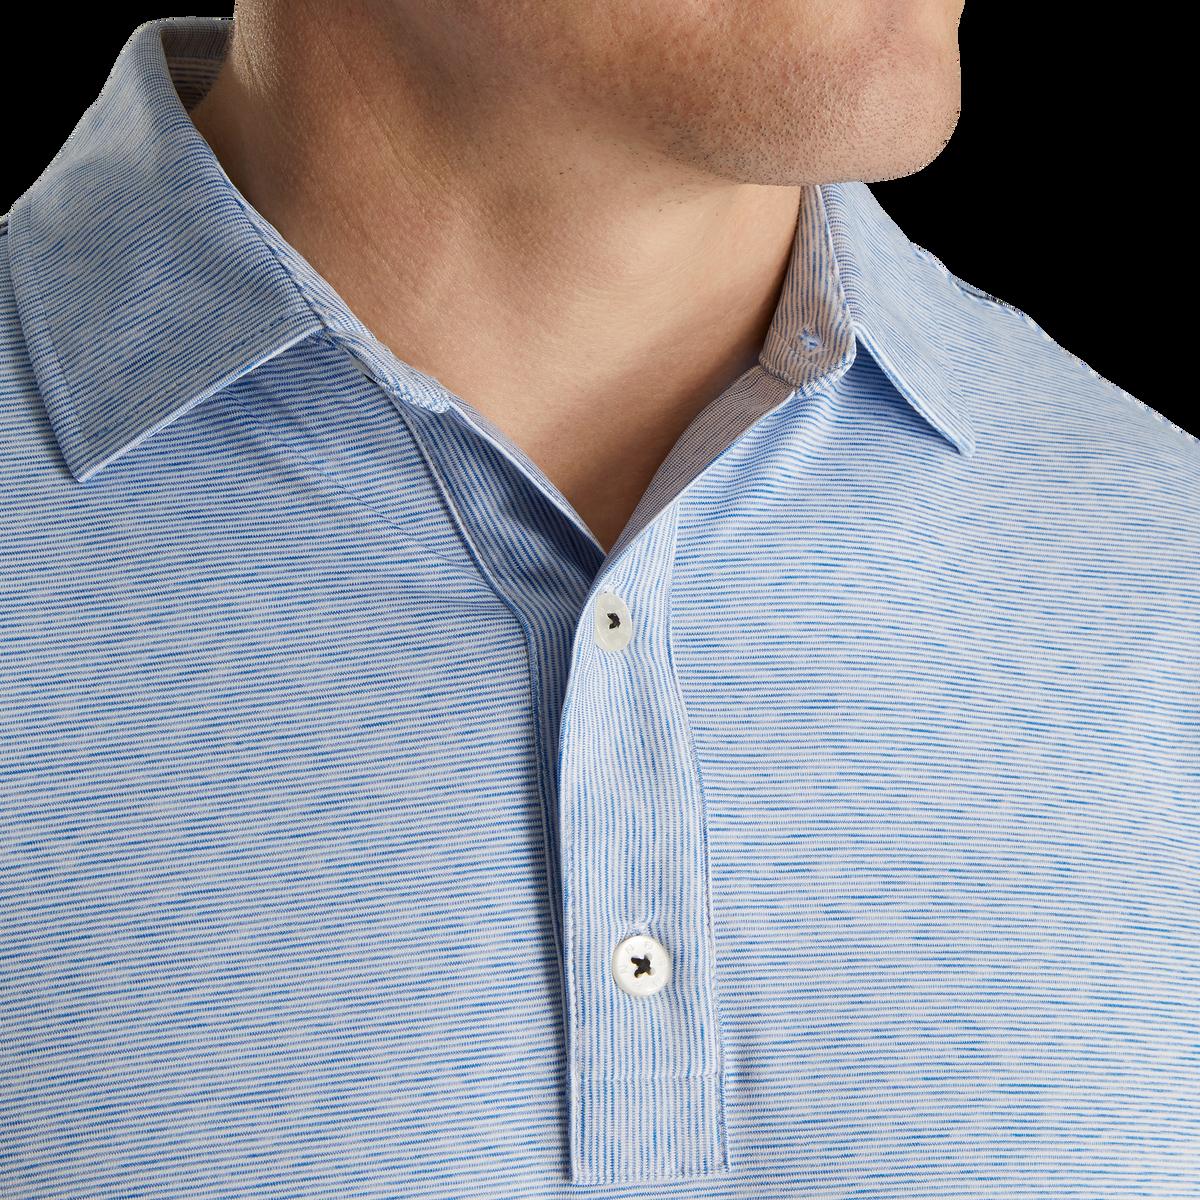 Lisle Space Dye Microstripe Self Collar